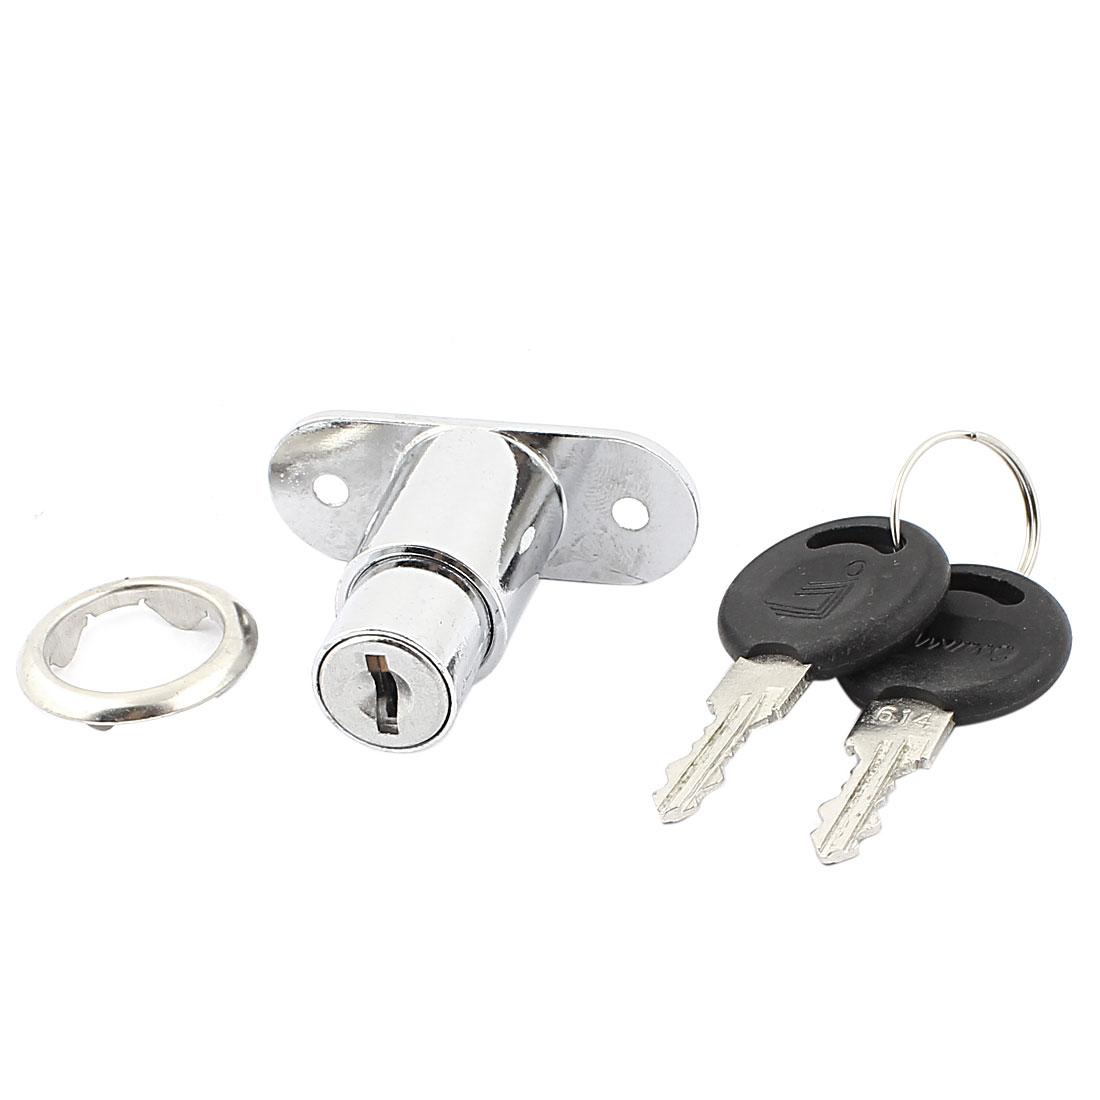 Cabinets Drawers Security Metal Cam Lock Lockers w 2 Keys